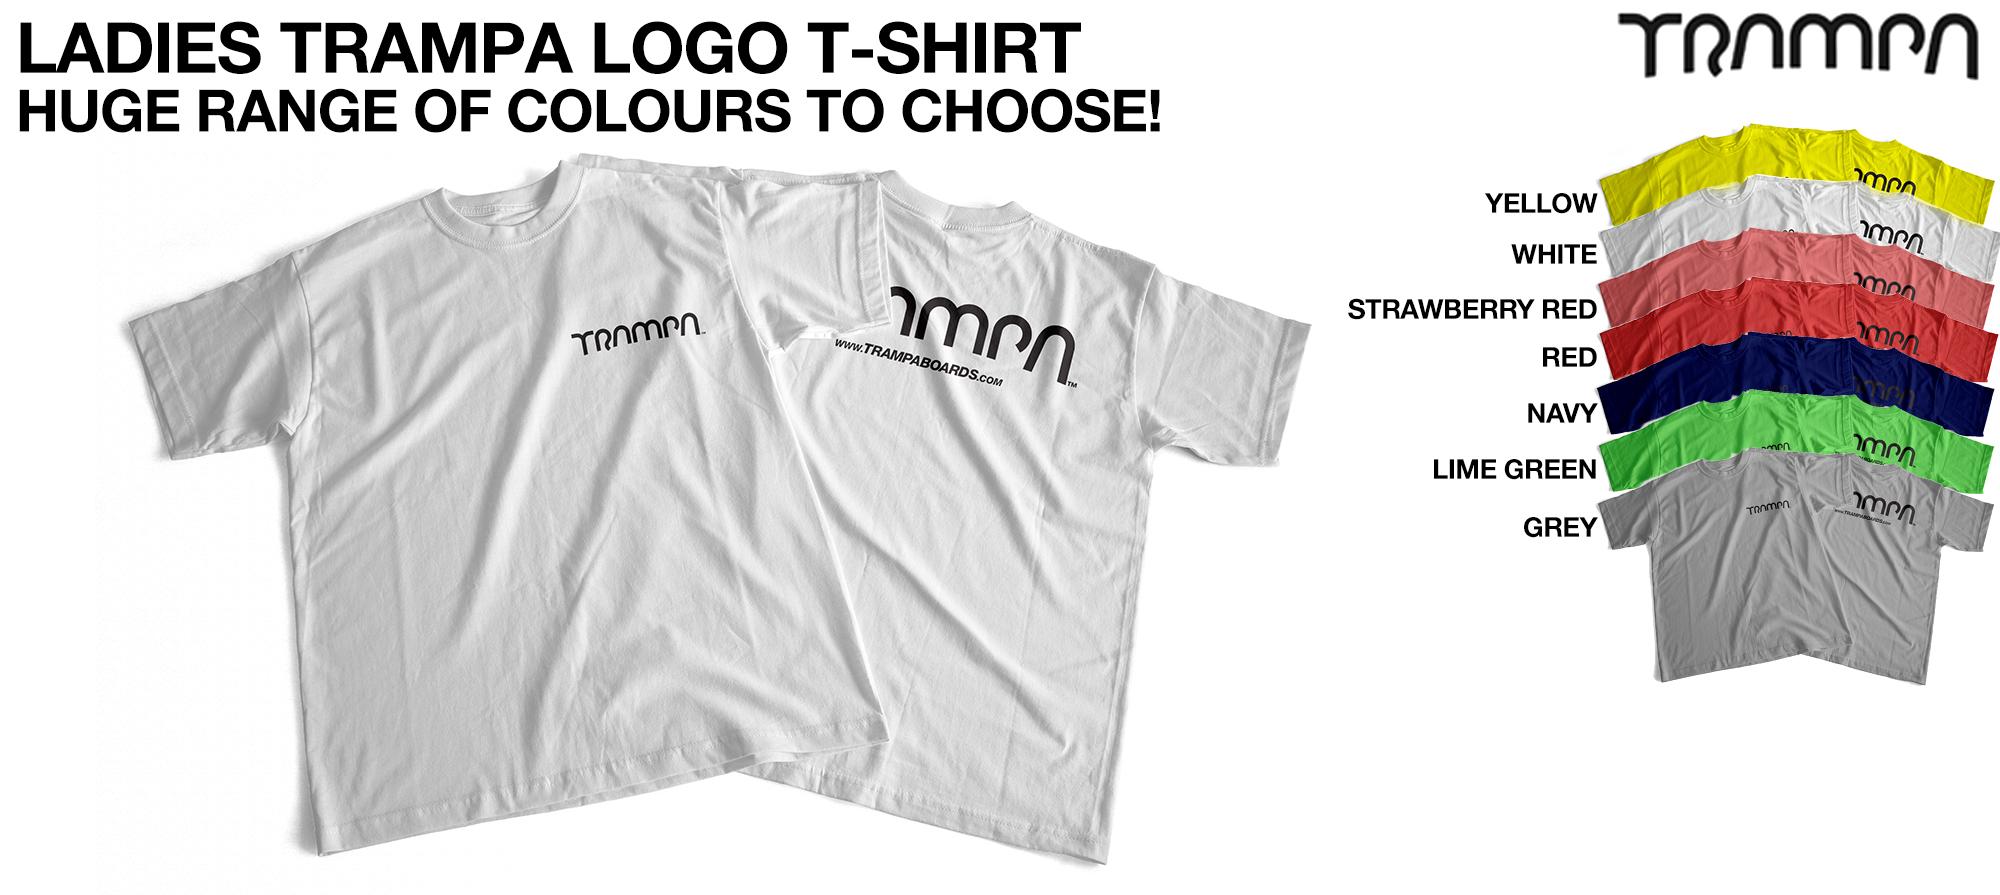 Ladies TRAMPA LOGO T-Shirt - Huge choice of colours!